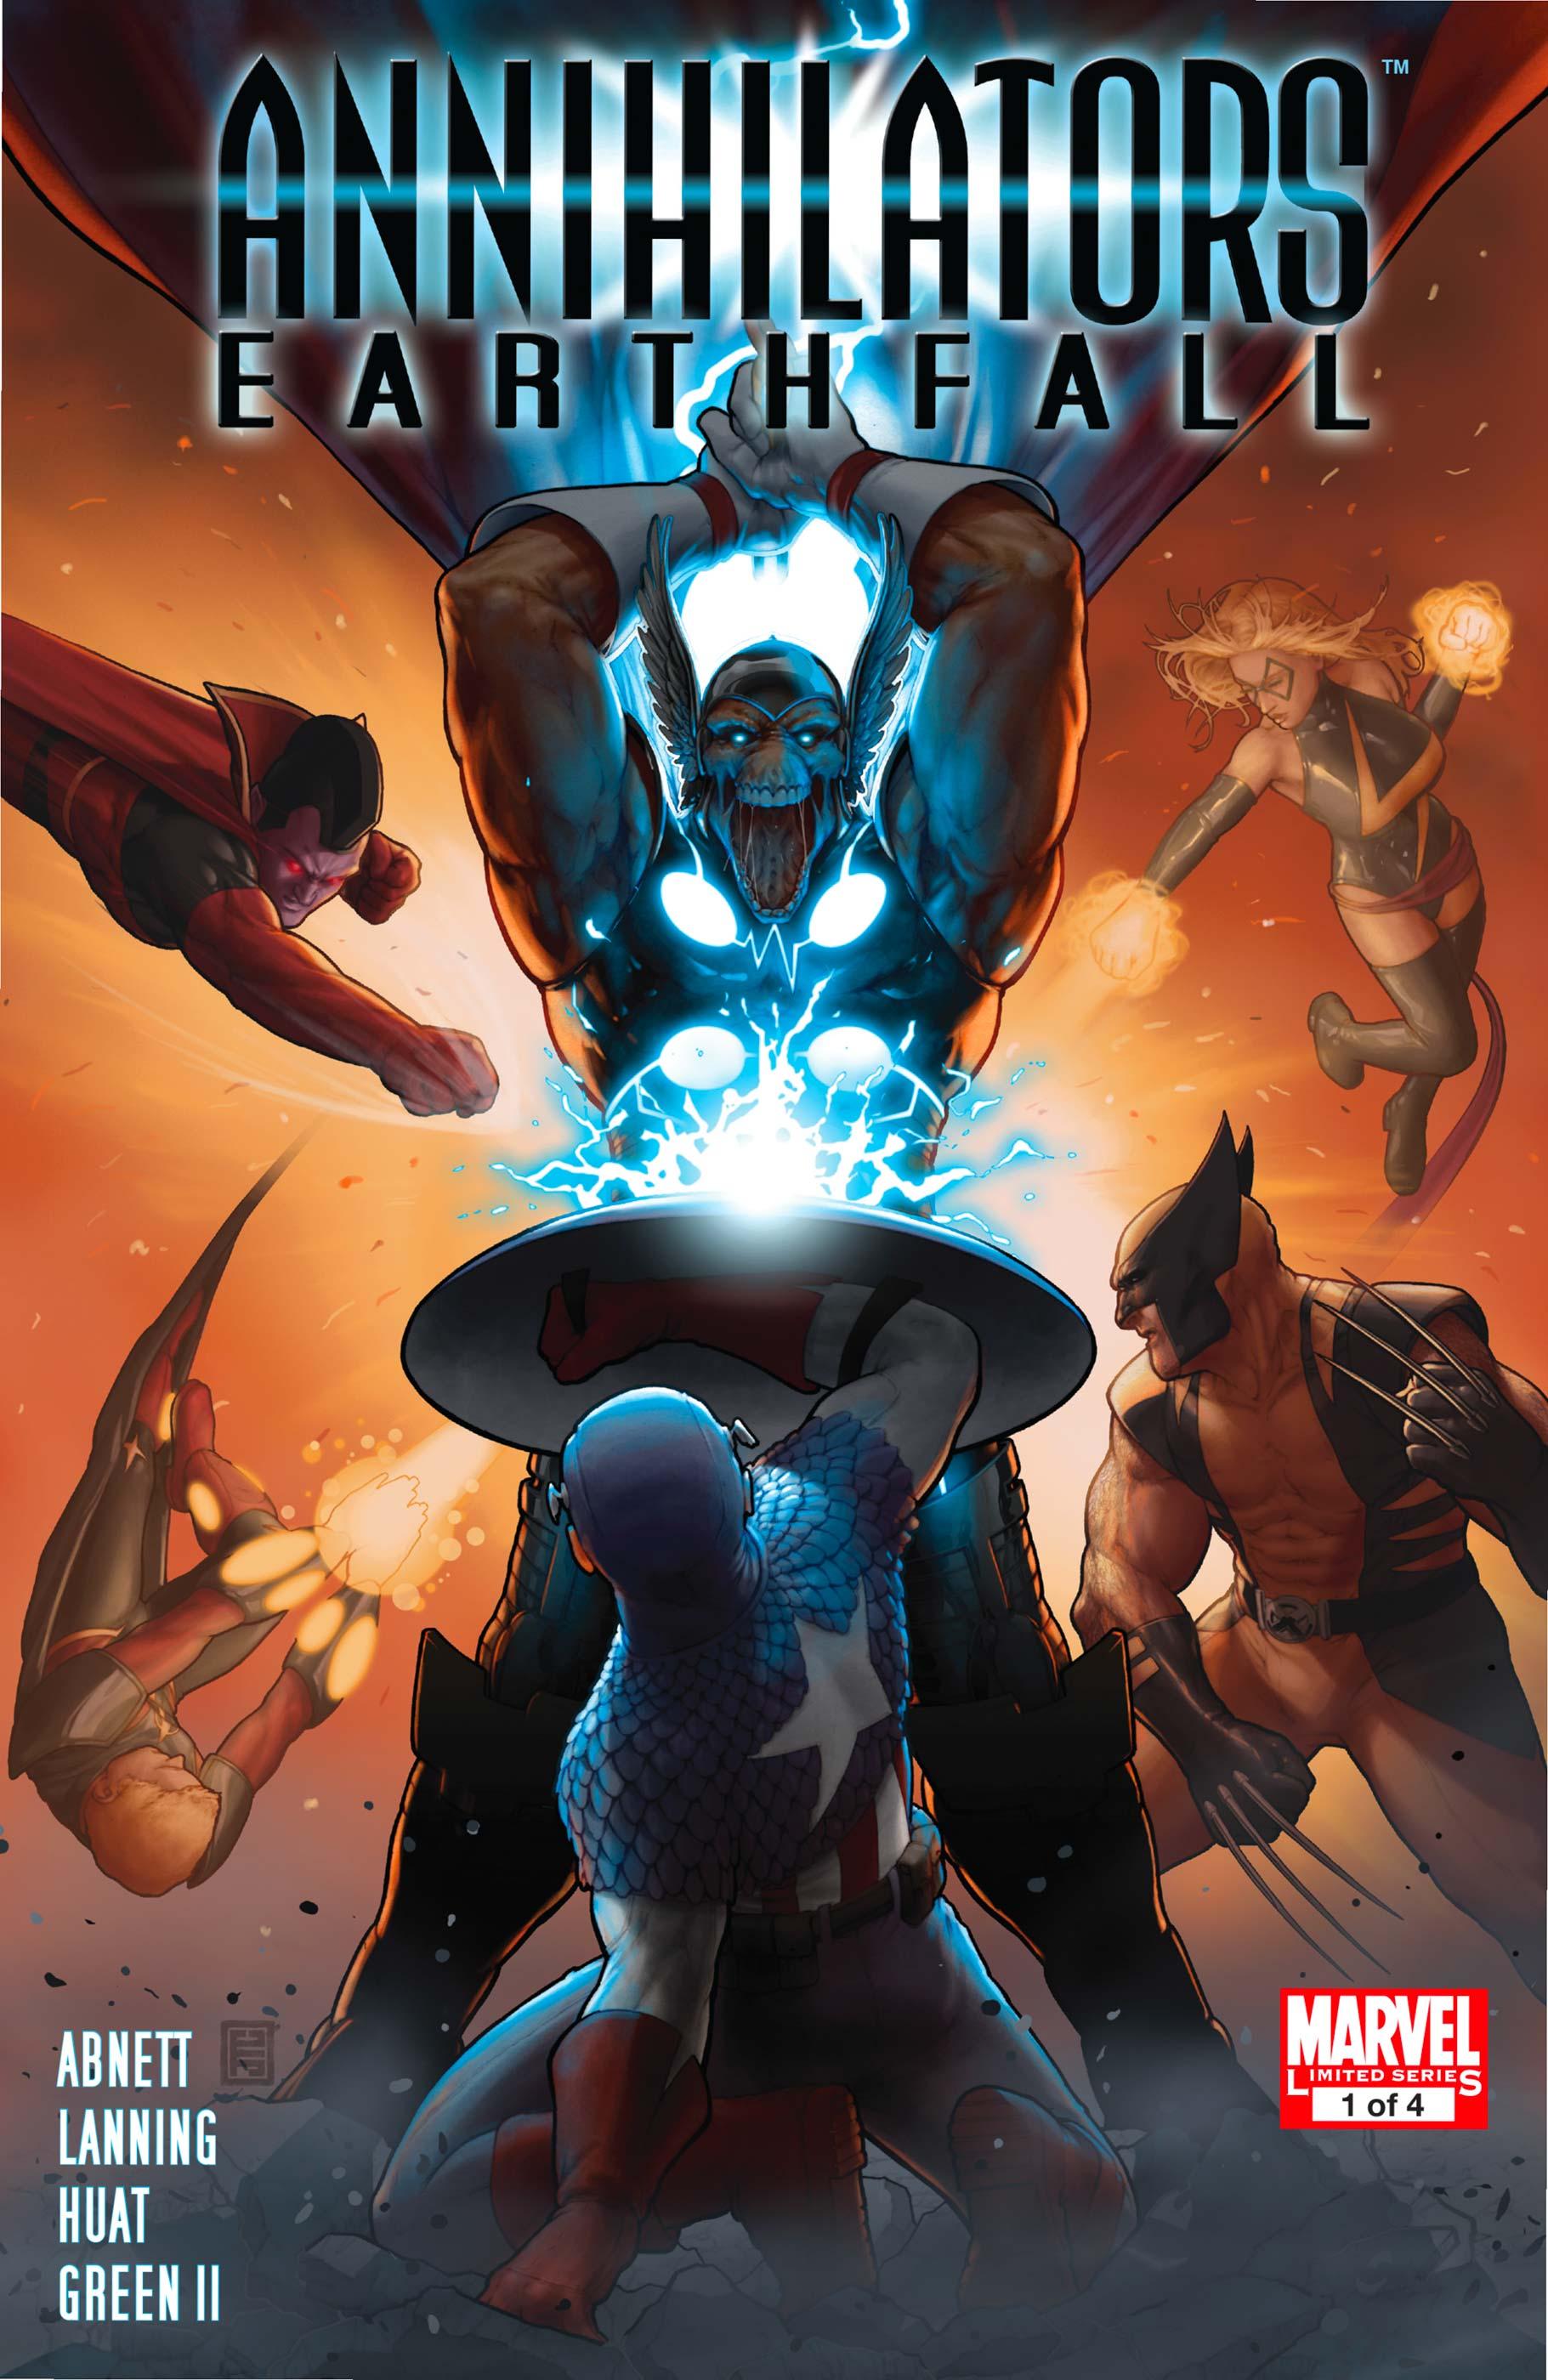 Annihilators: Earthfall (2011) #1